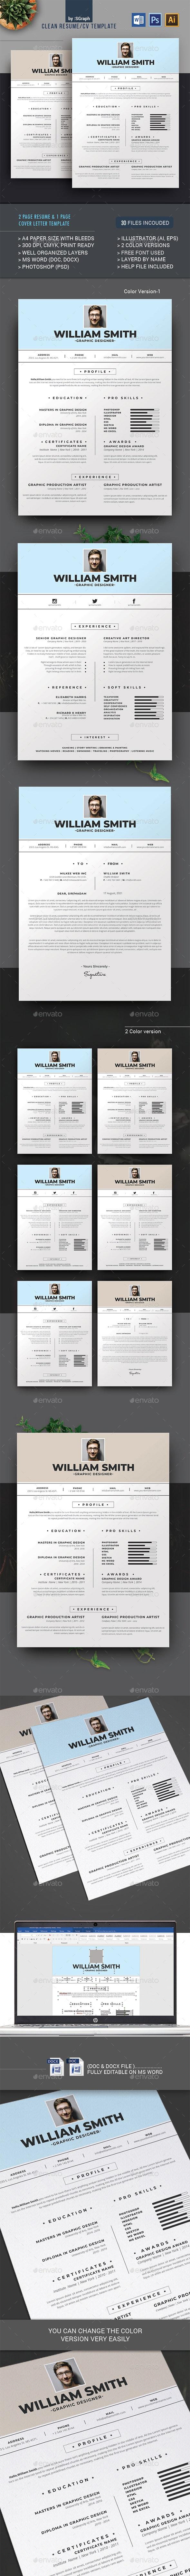 Clean Resume/CV - Stationery Print